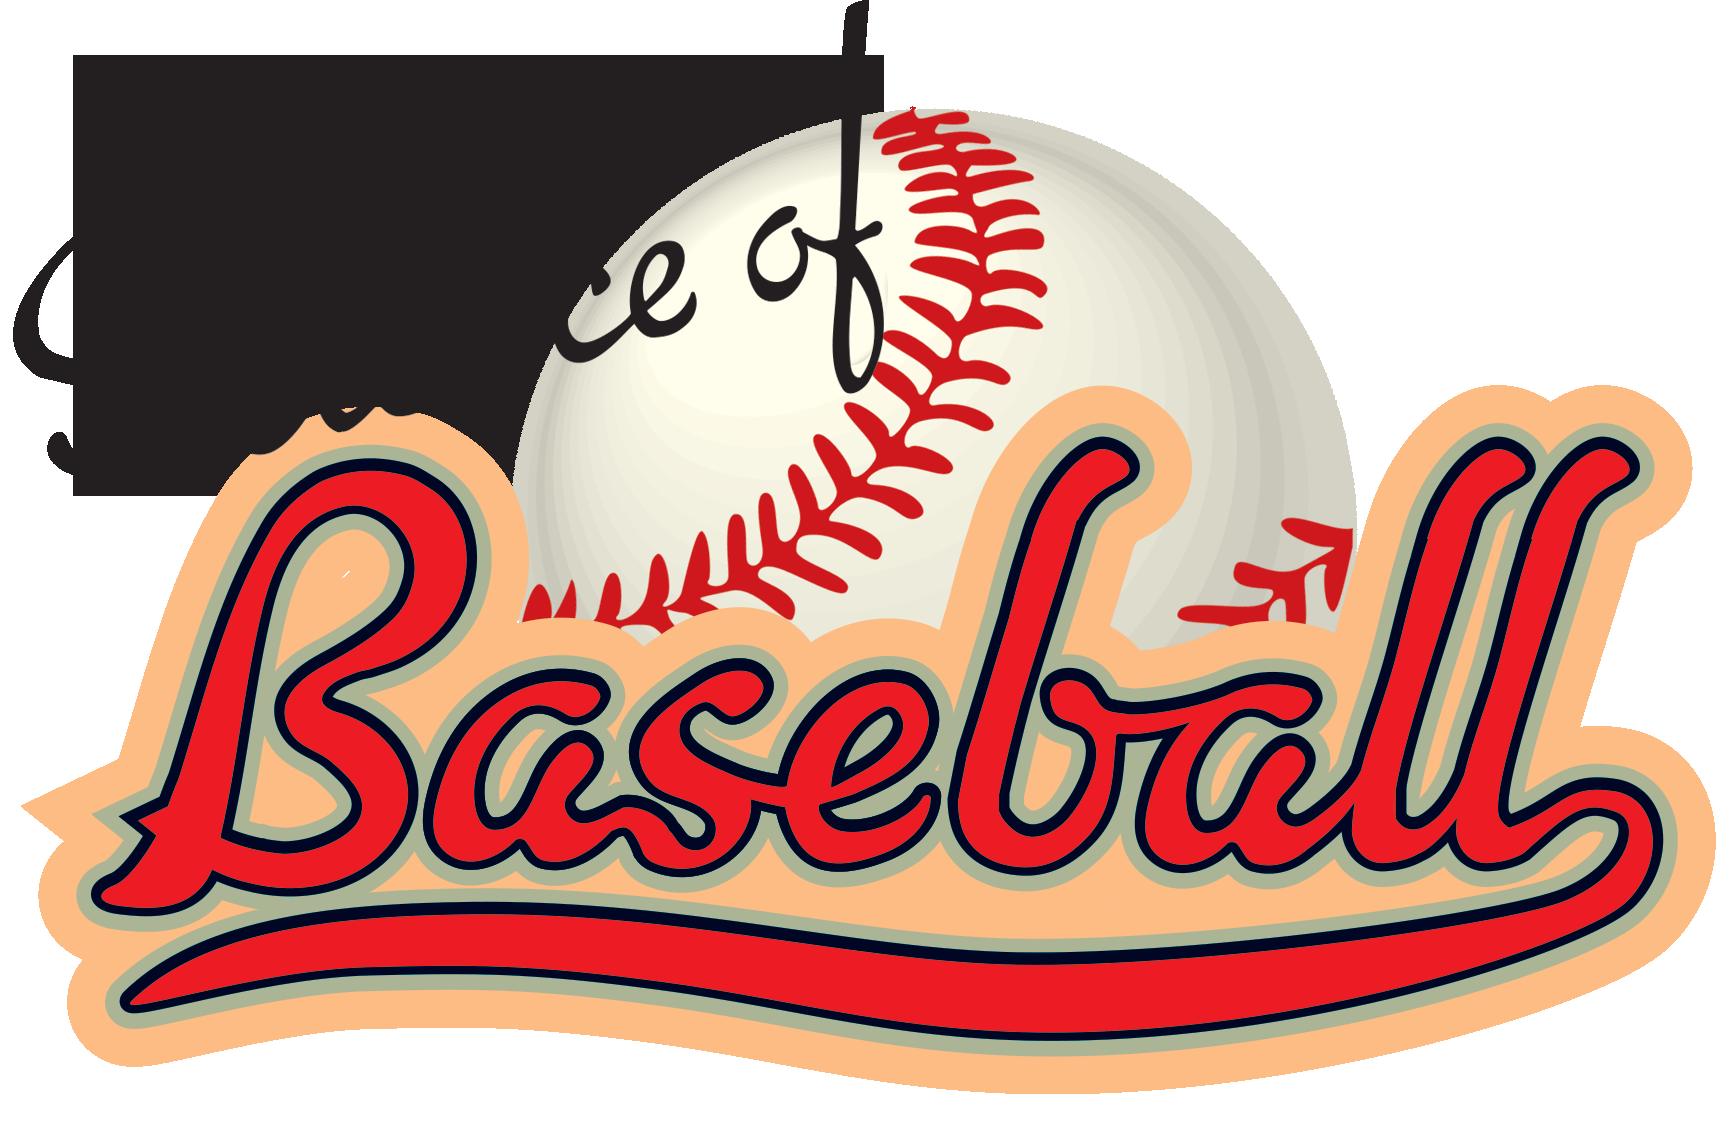 Scienceofbaseball logo png science. Clipart rocket baseball